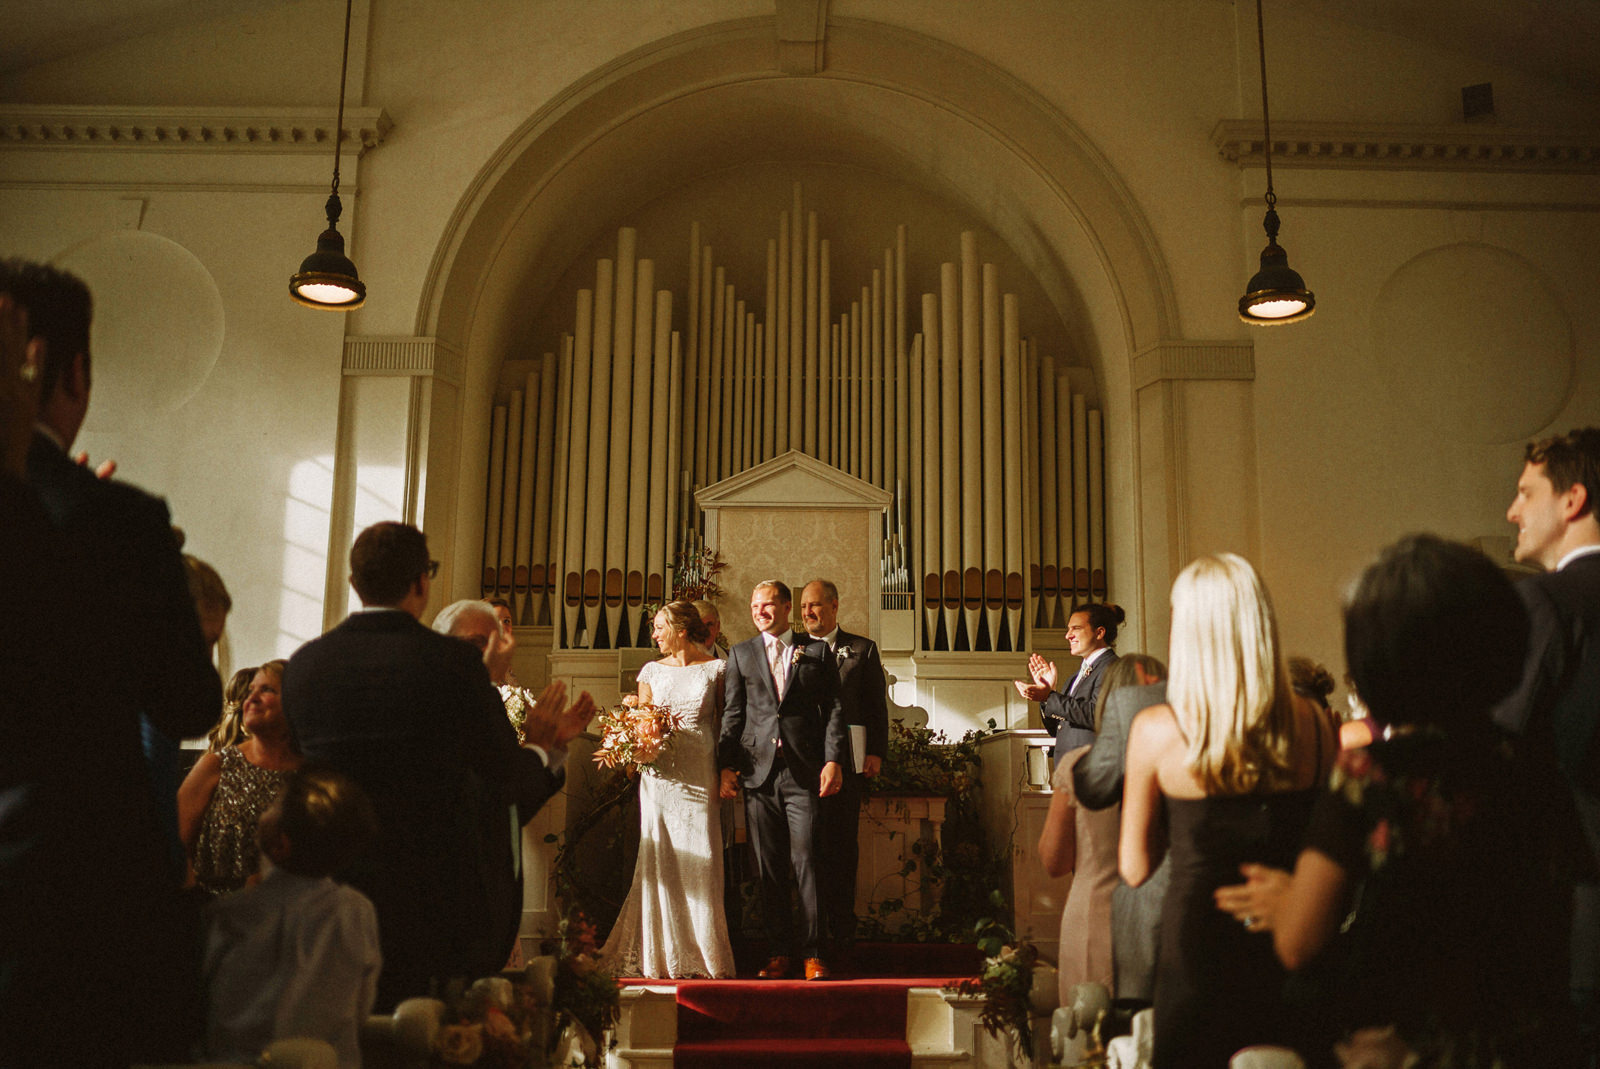 bridgeport-wedding-080 BRIDGEPORT, CONNECTICUT BACKYARD WEDDING